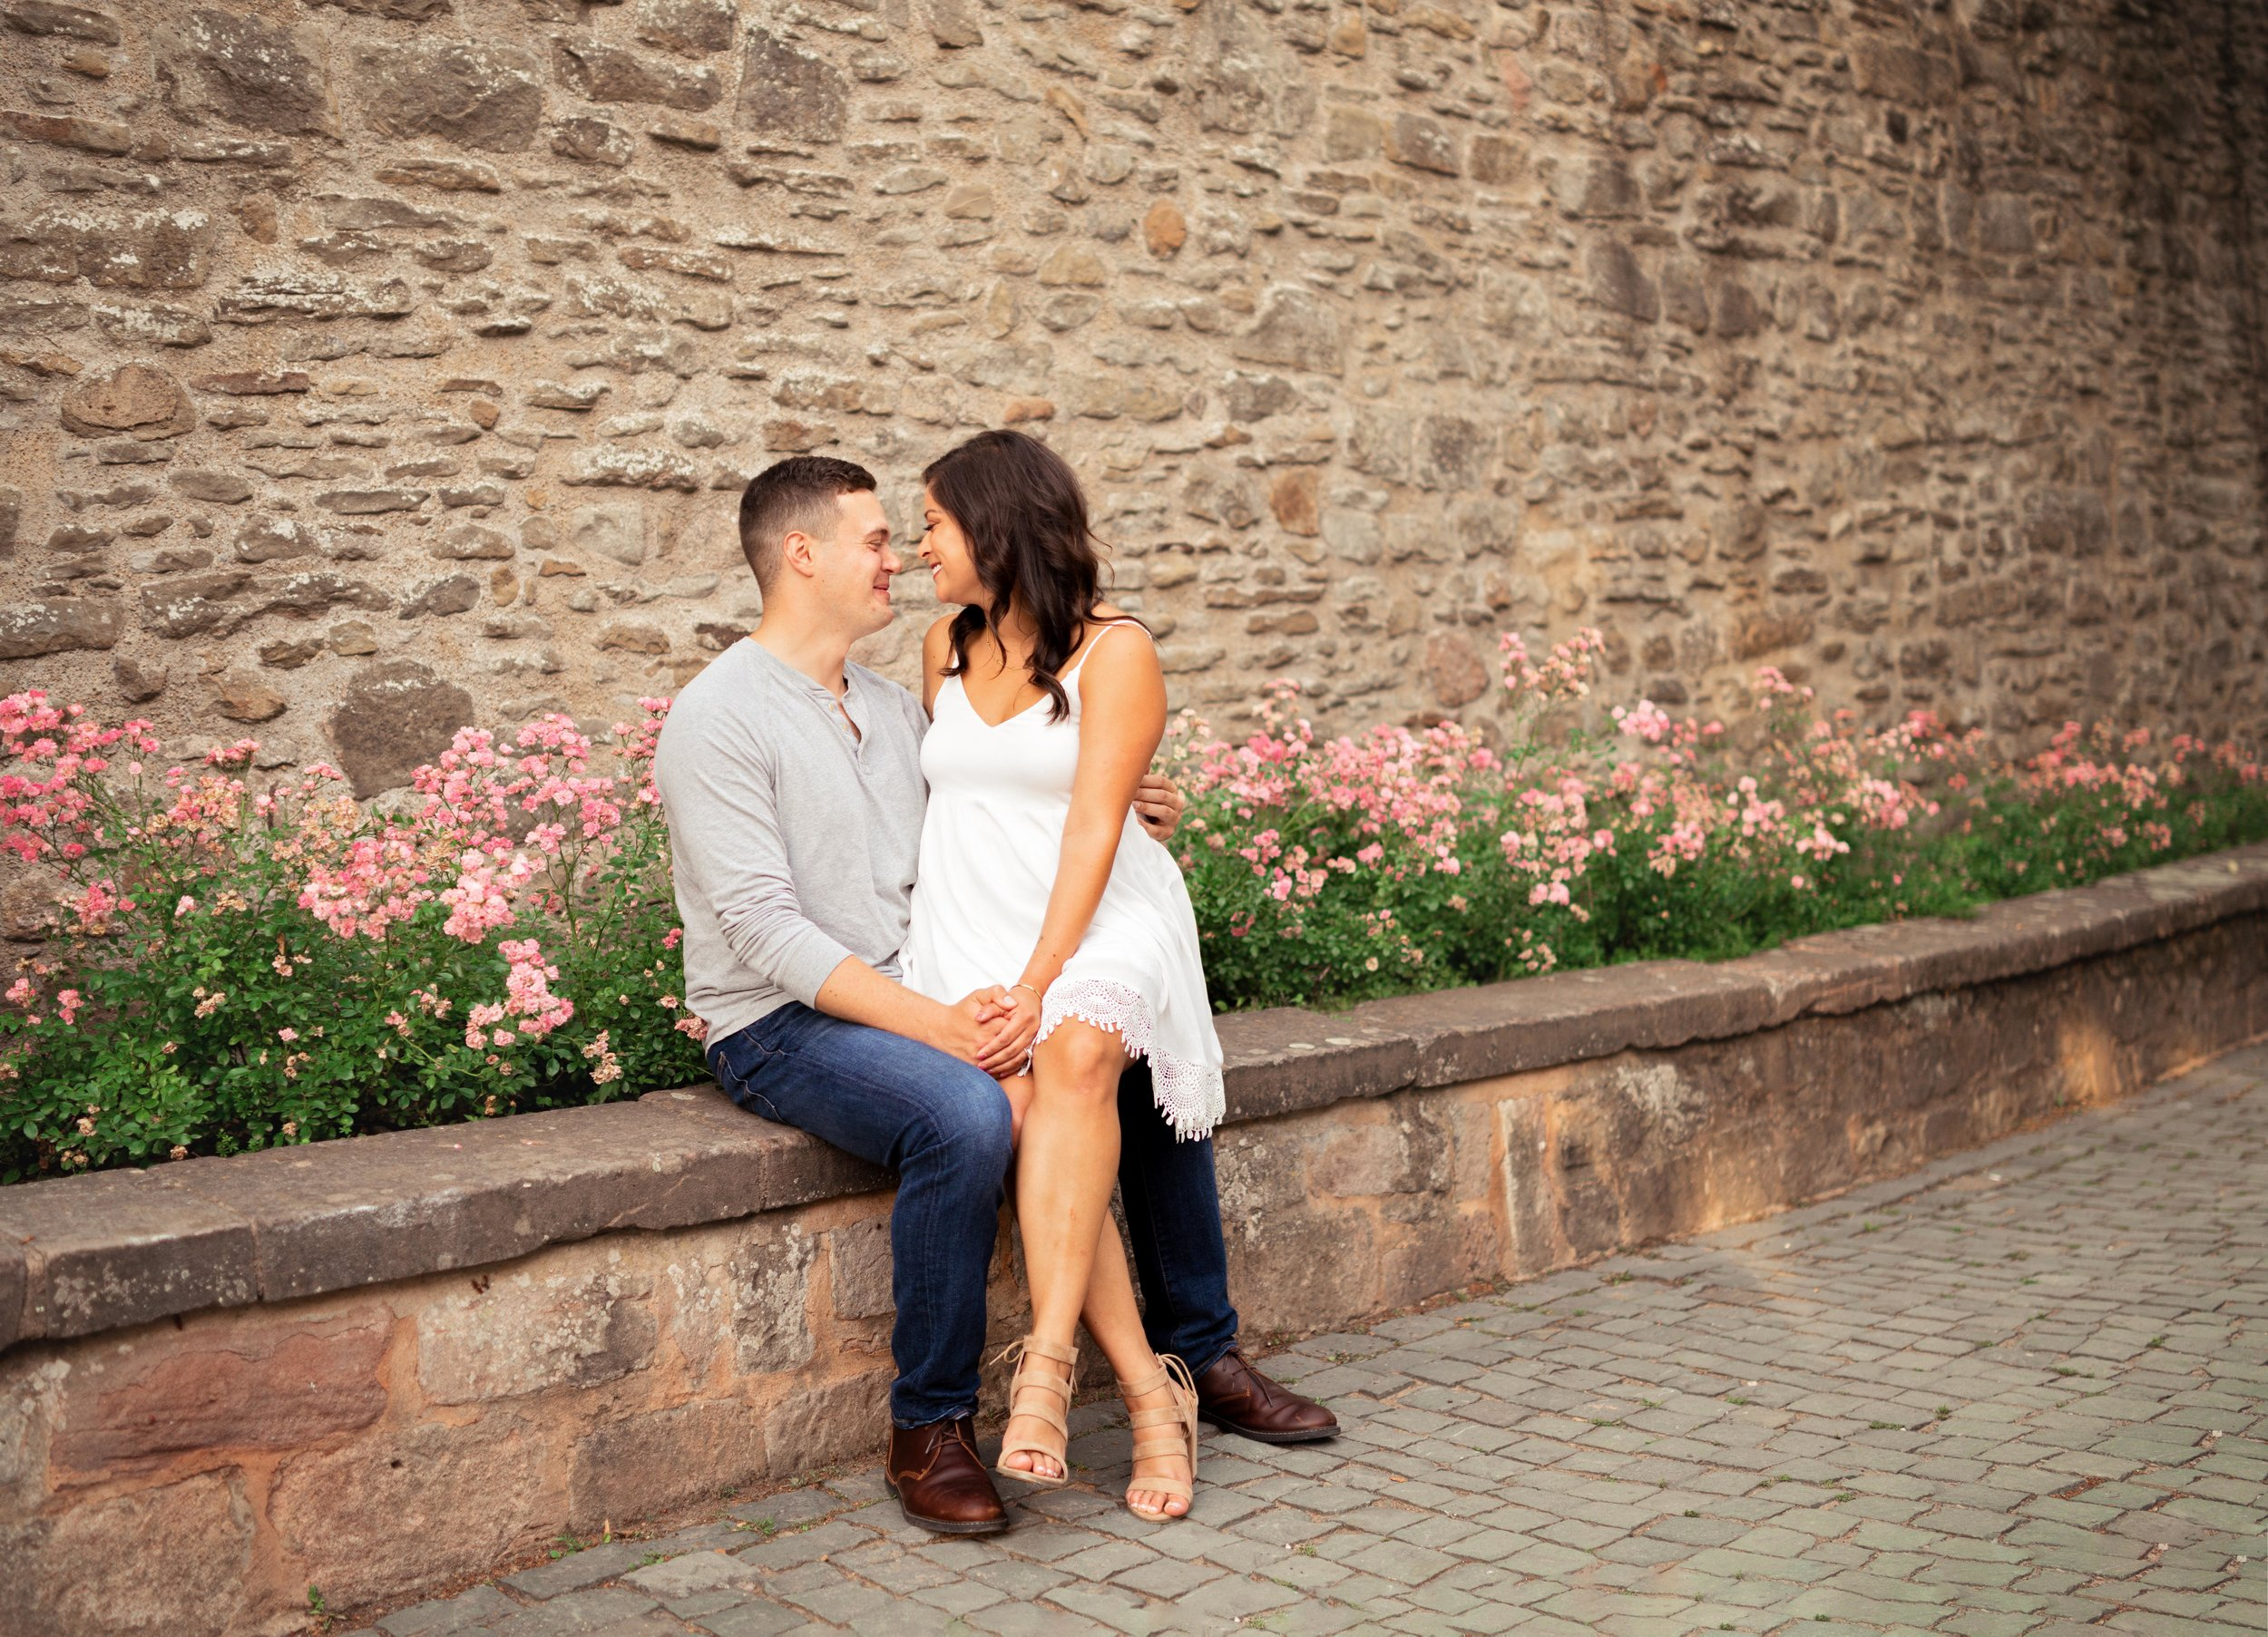 ramstein-kmc-couple-engagement-photographer-lichtenberg-castle-sarah-havens (3).jpg